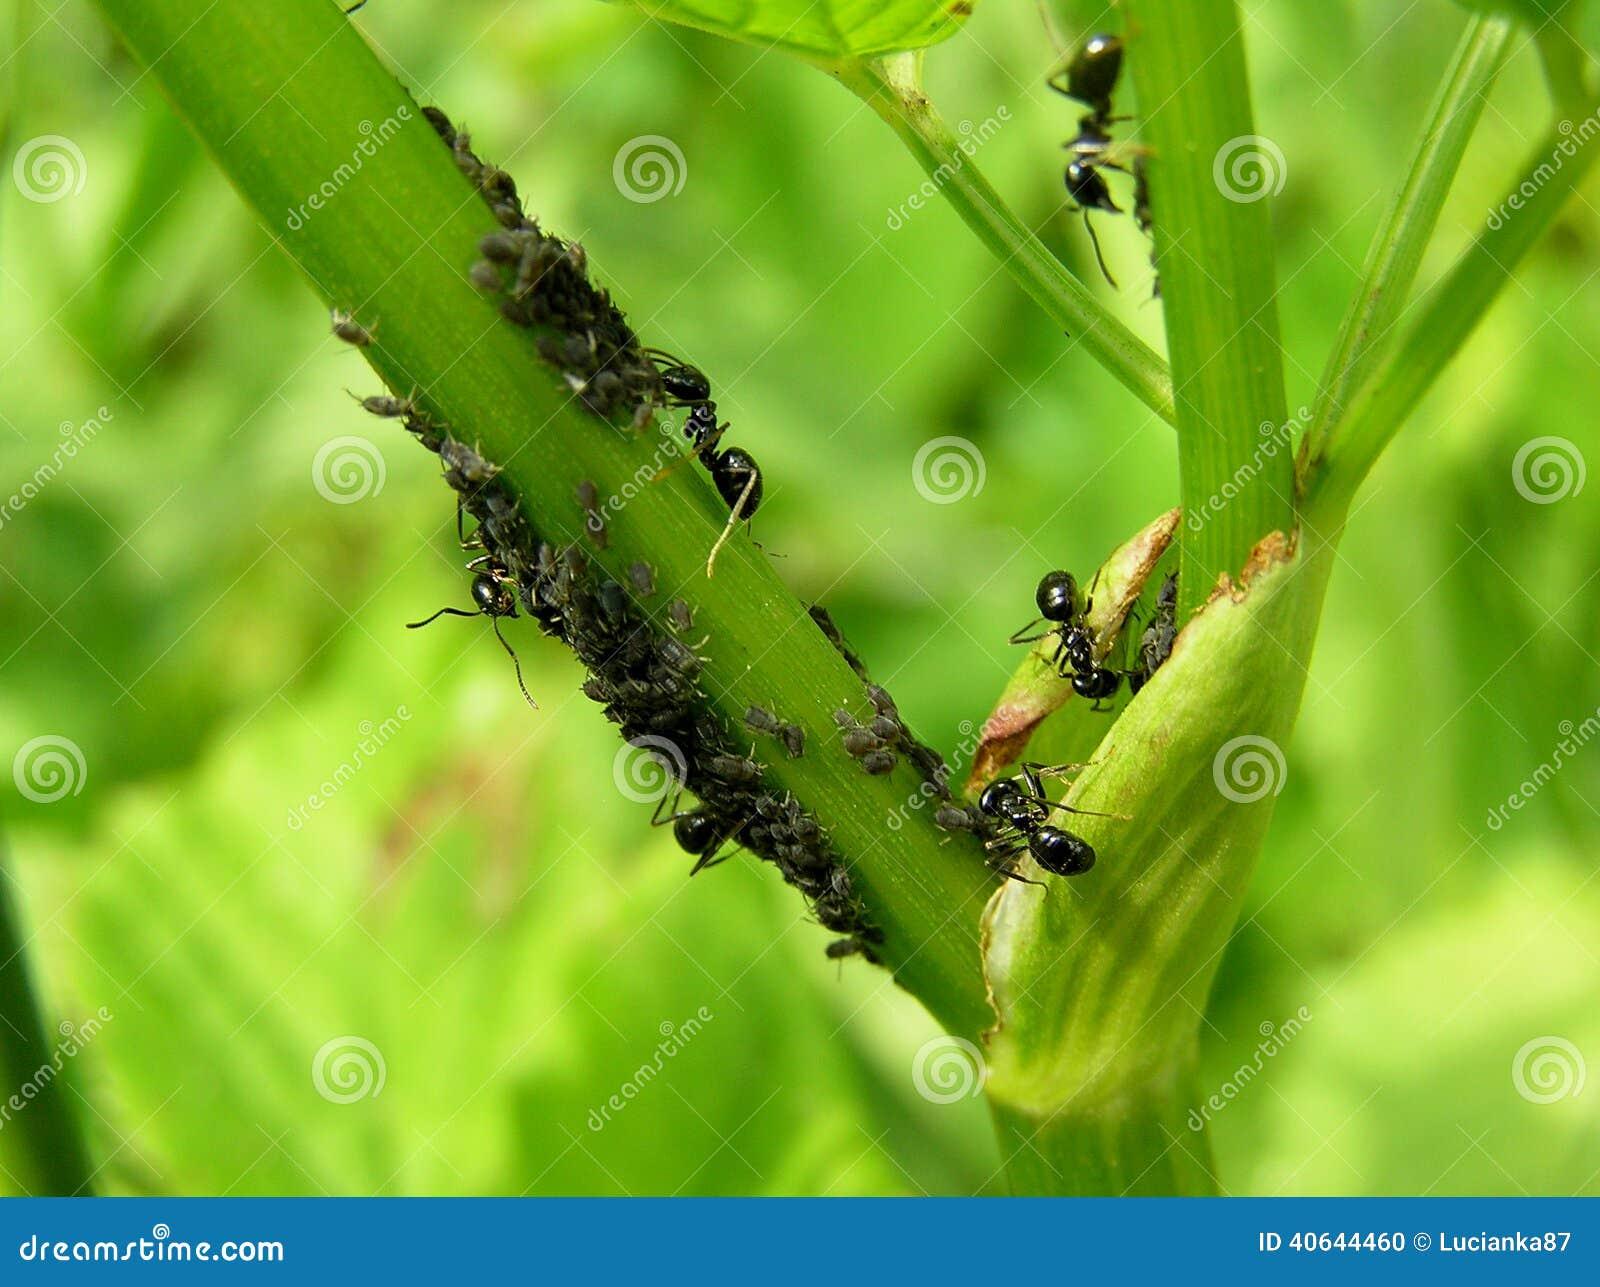 Ameisen essen Blattläuse